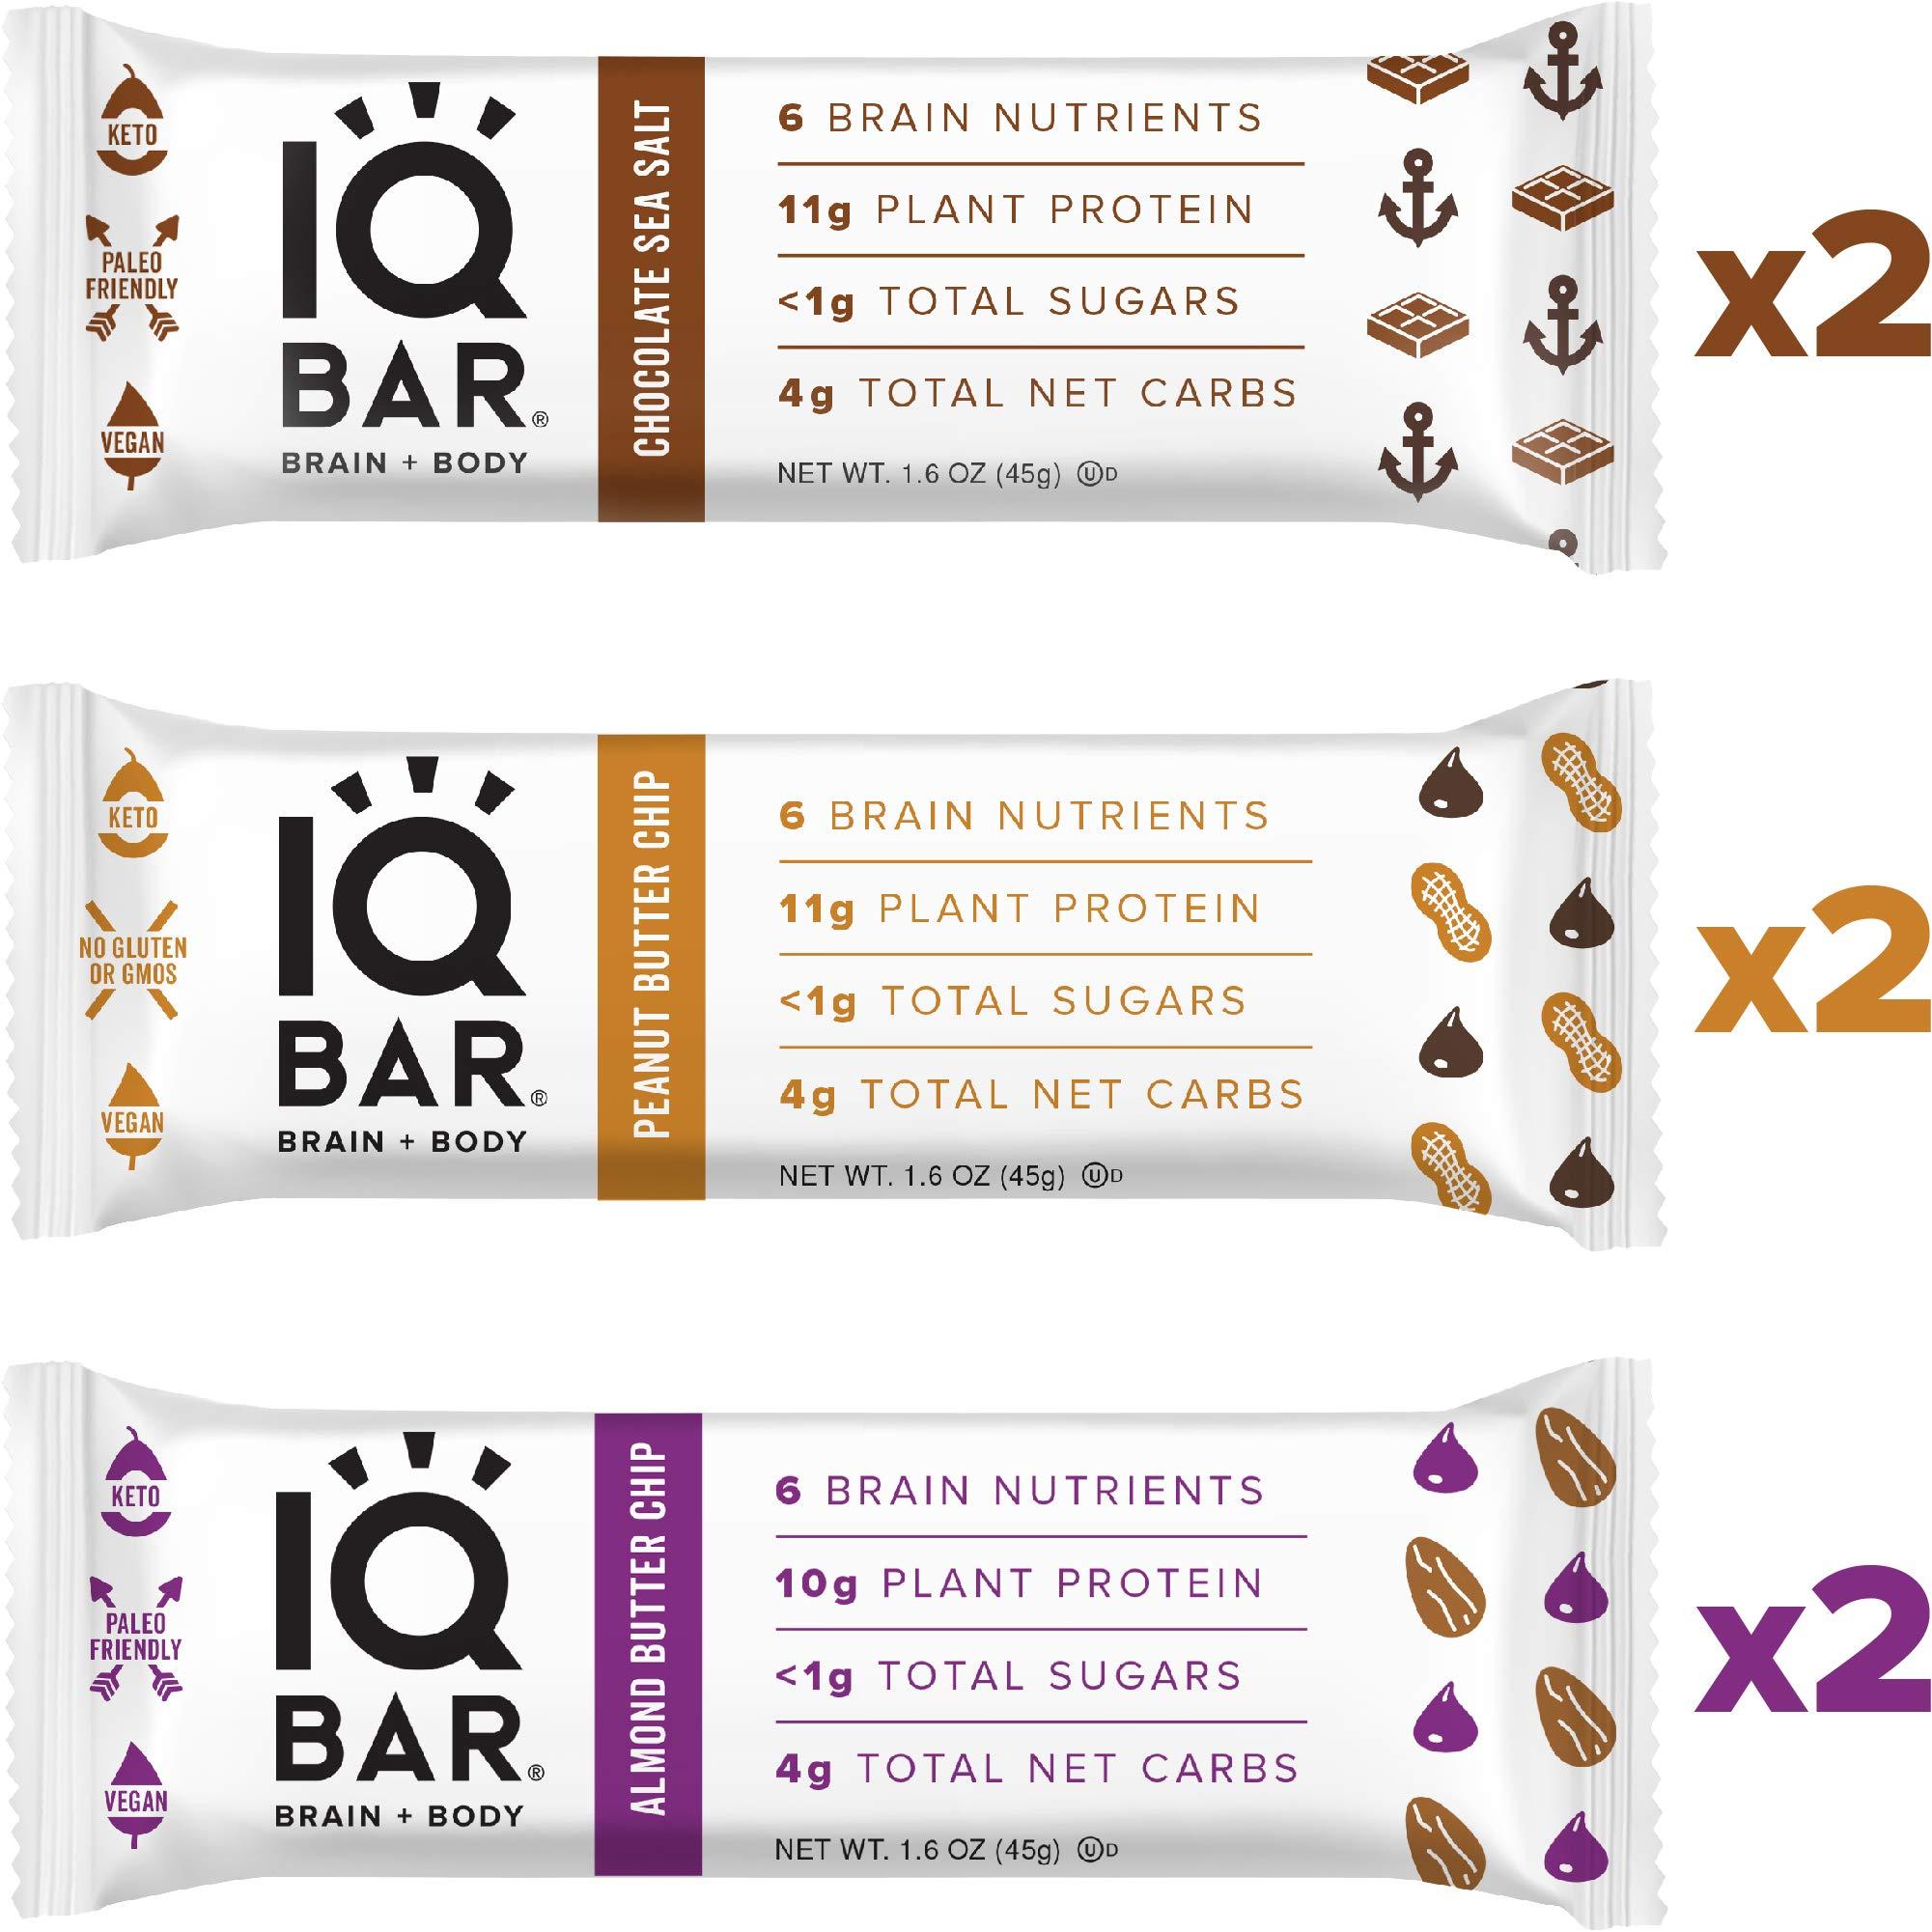 IQ BAR Brain + Body Bar Chocolate Lovers Variety Pack | 10g Plant Protein, 1g Sugar, 4g Net Carbs, Keto, Paleo Friendly, Vegan, Gluten Free, Low Carb, 1.6oz Bar, 6 Count by IQ BAR